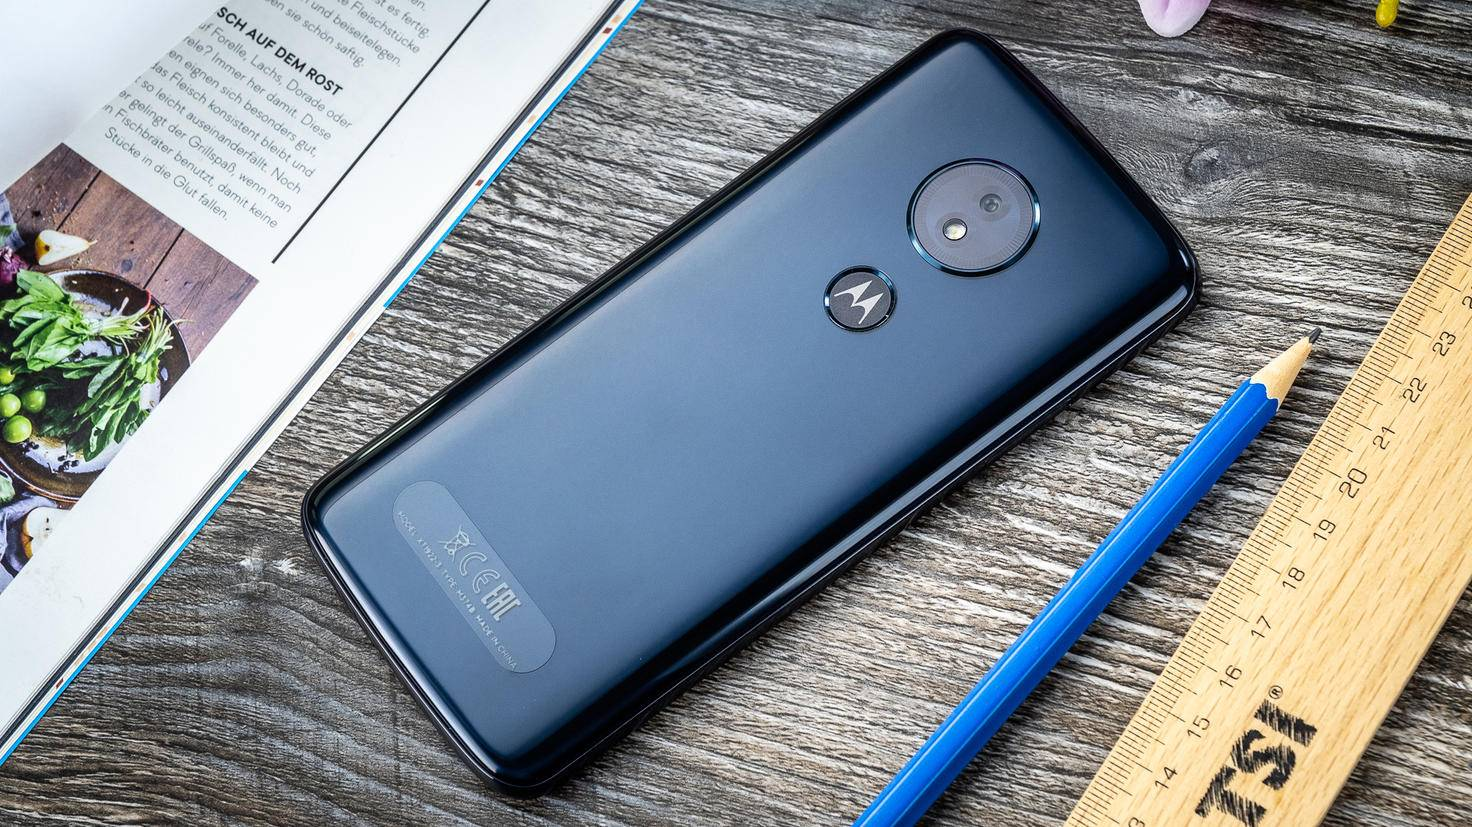 Motorola-Moto-G6-Play-TURN-ON-4